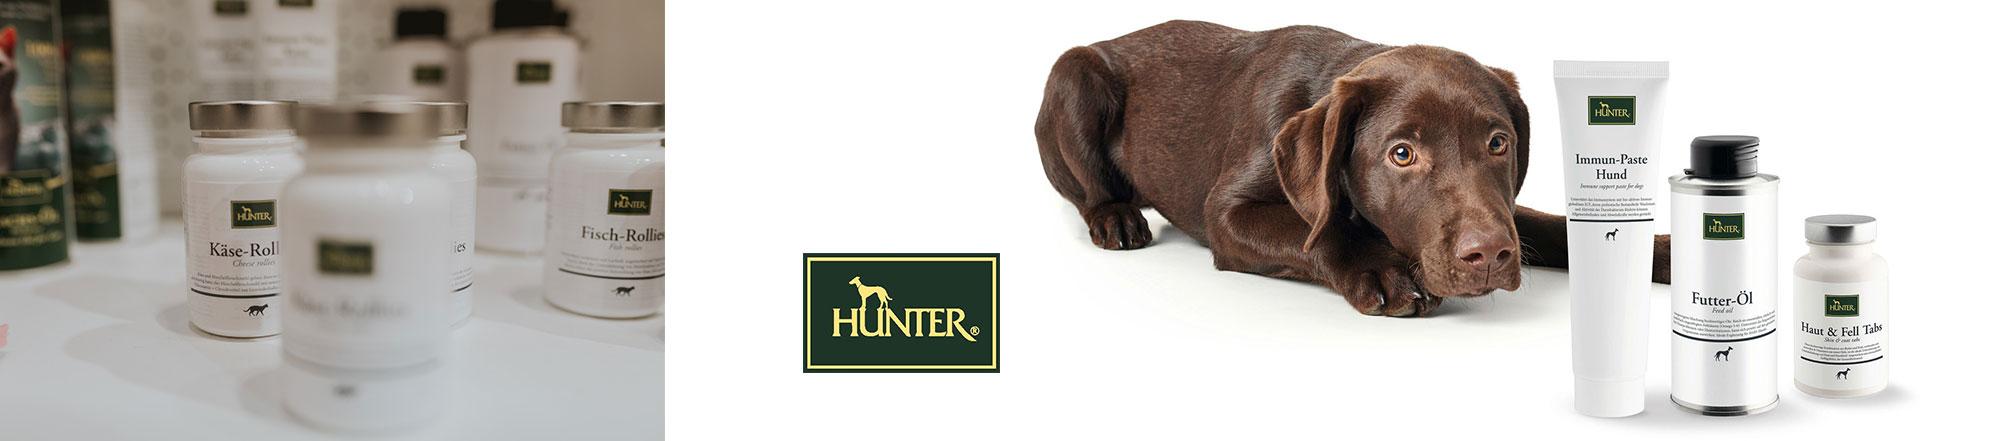 Hunter Ergänzungsfuttermittel für Hunde